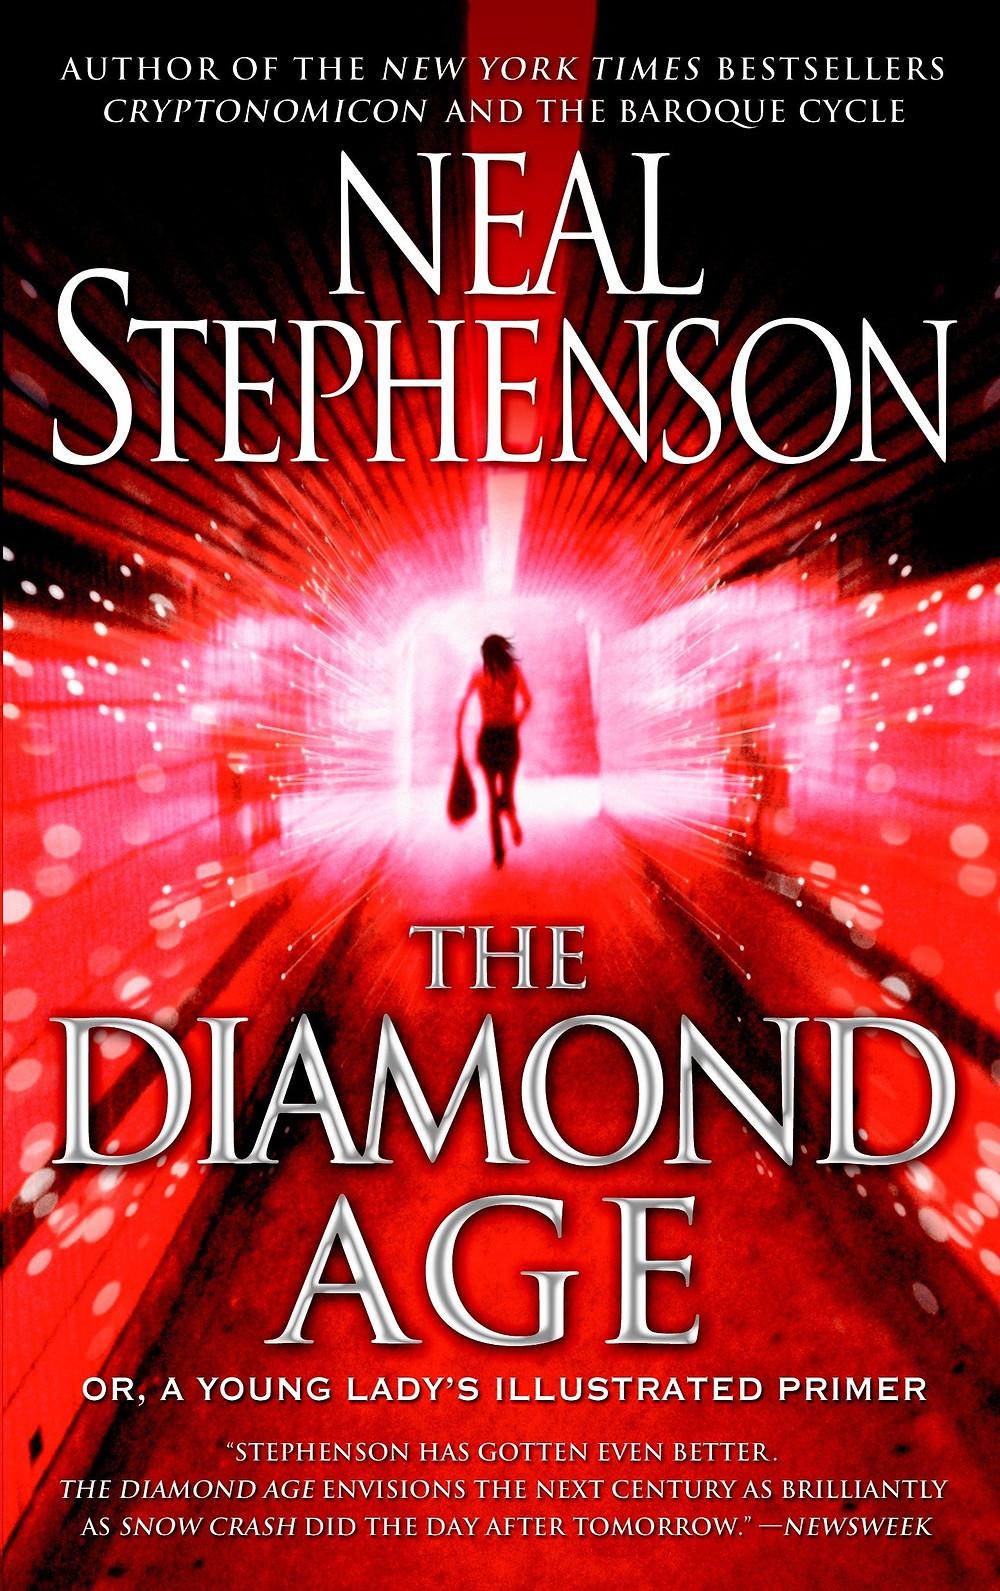 Diamond Age, by Neal Stephenson